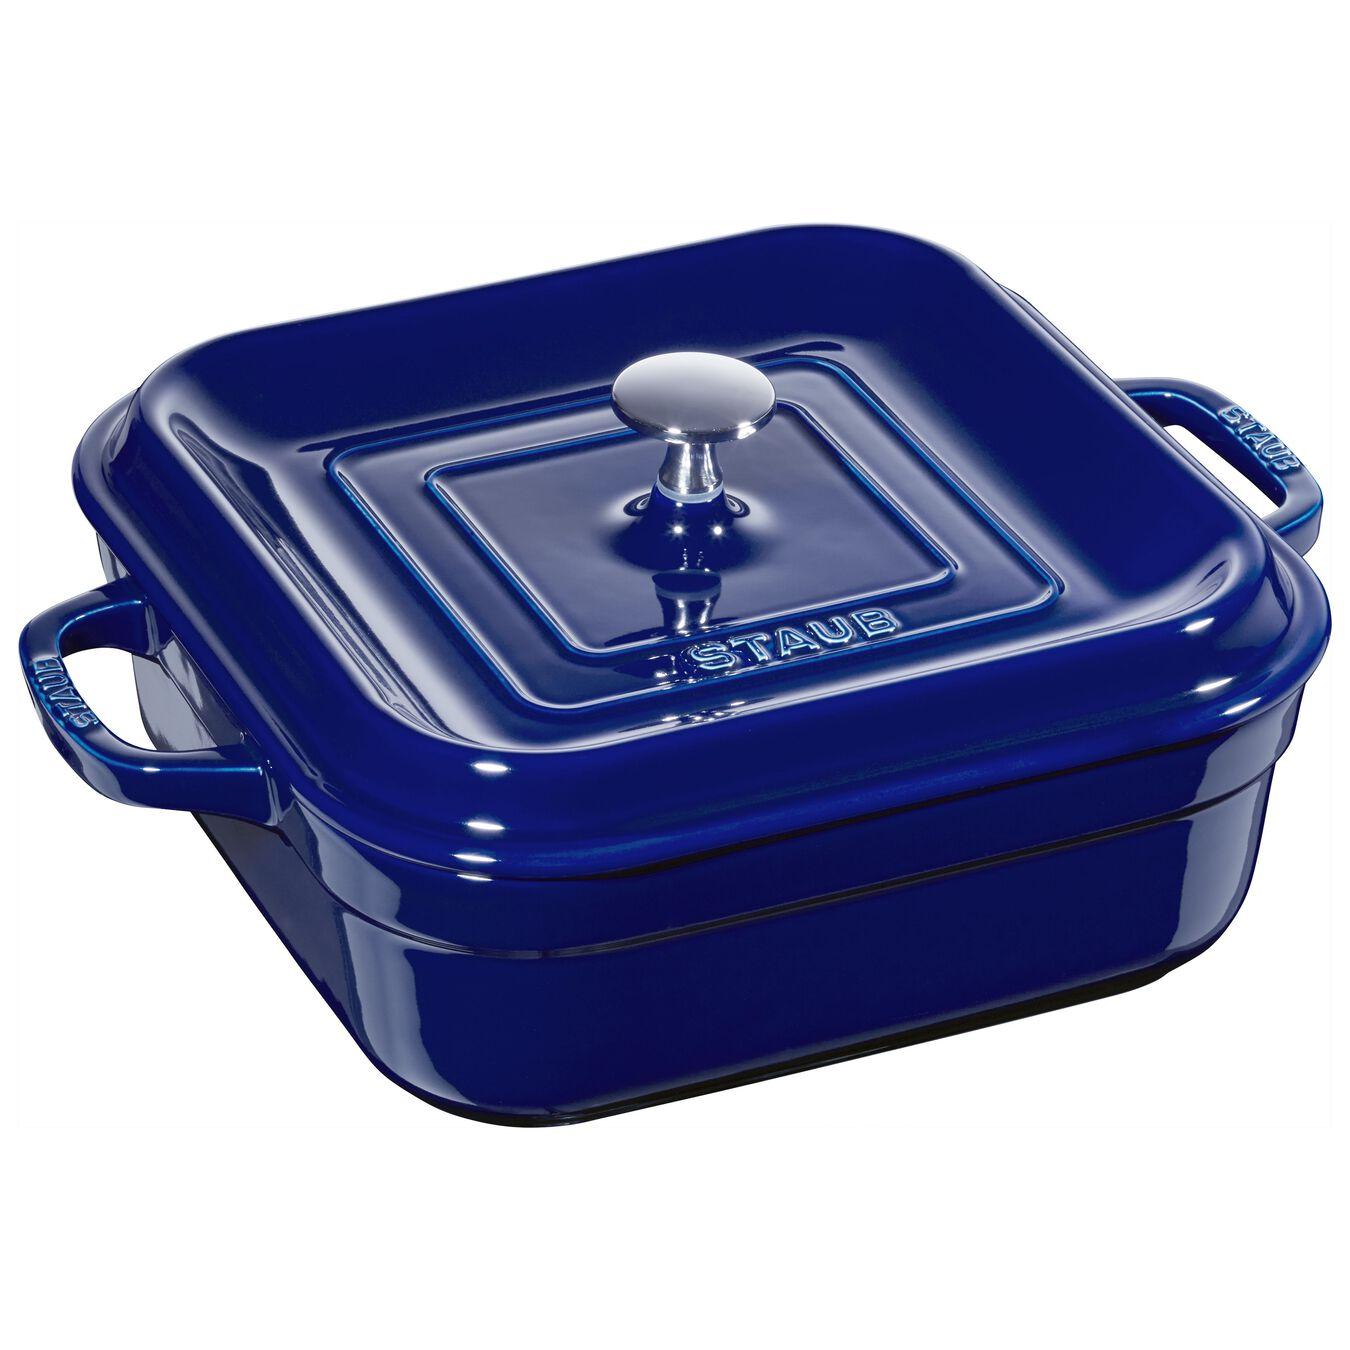 square, Oven dish, dark blue,,large 1